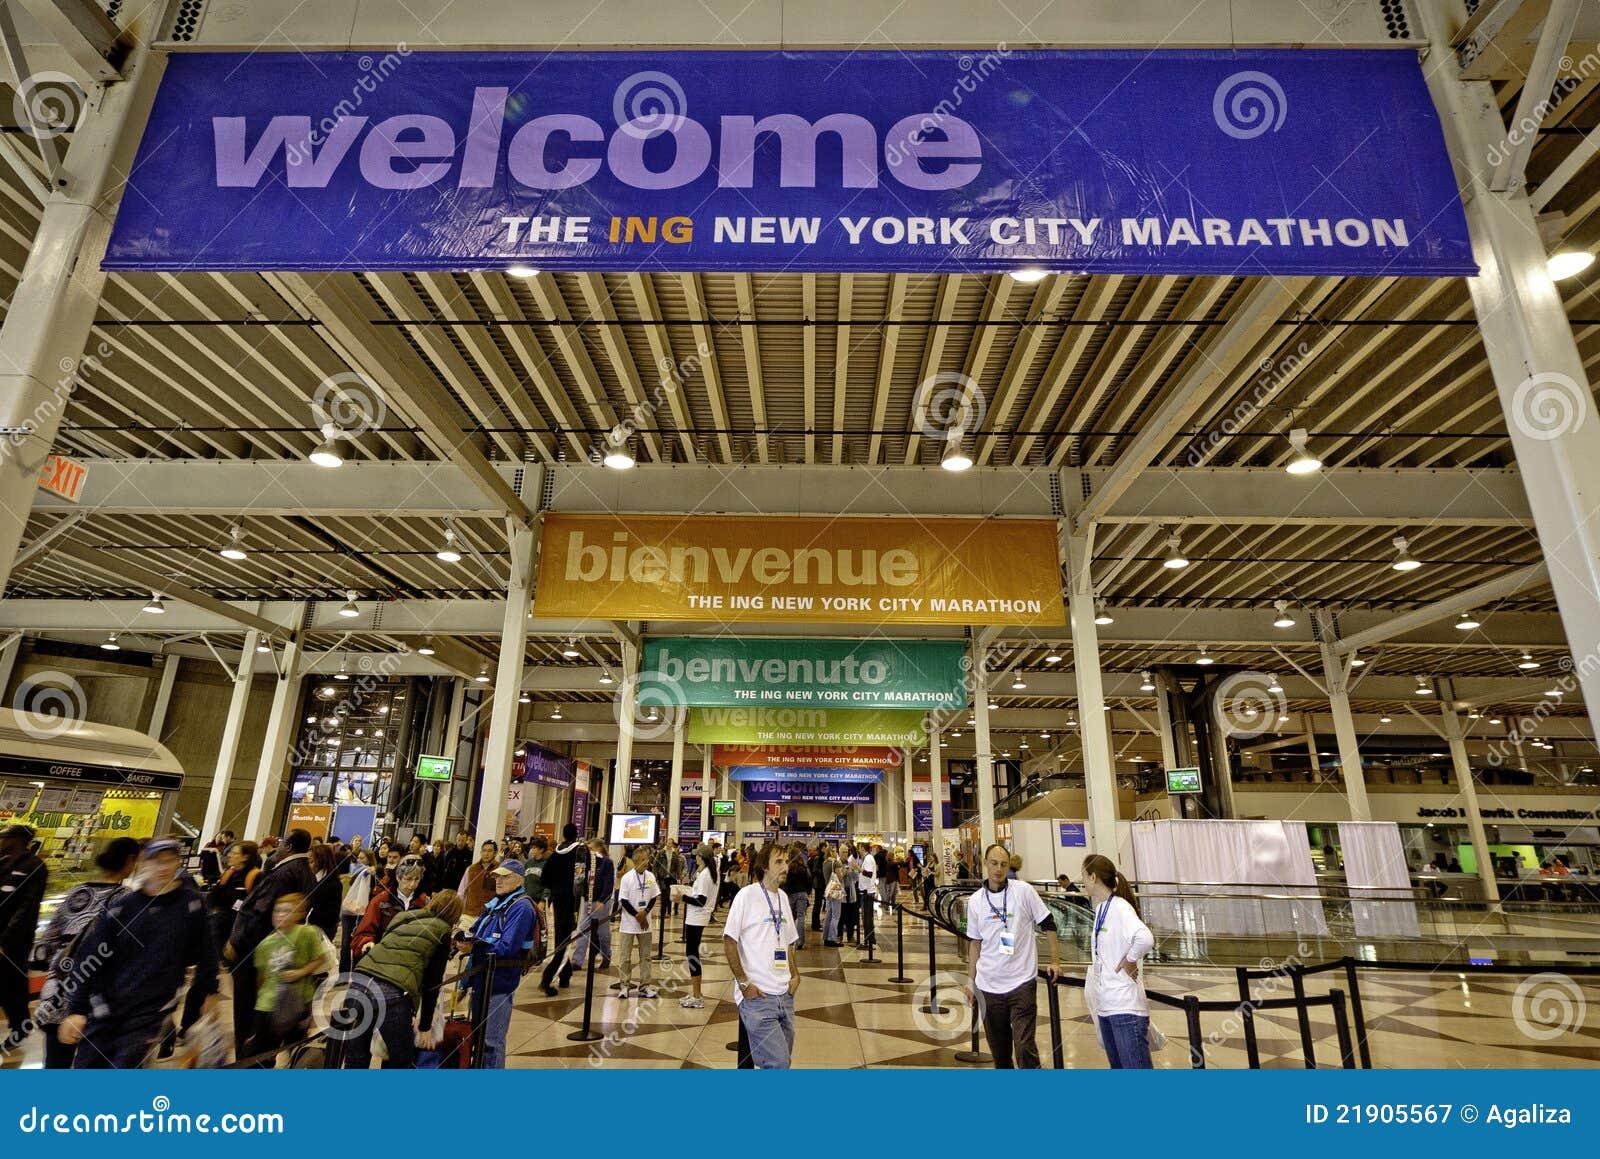 2011 New York City Marathon Expo At Javits Center